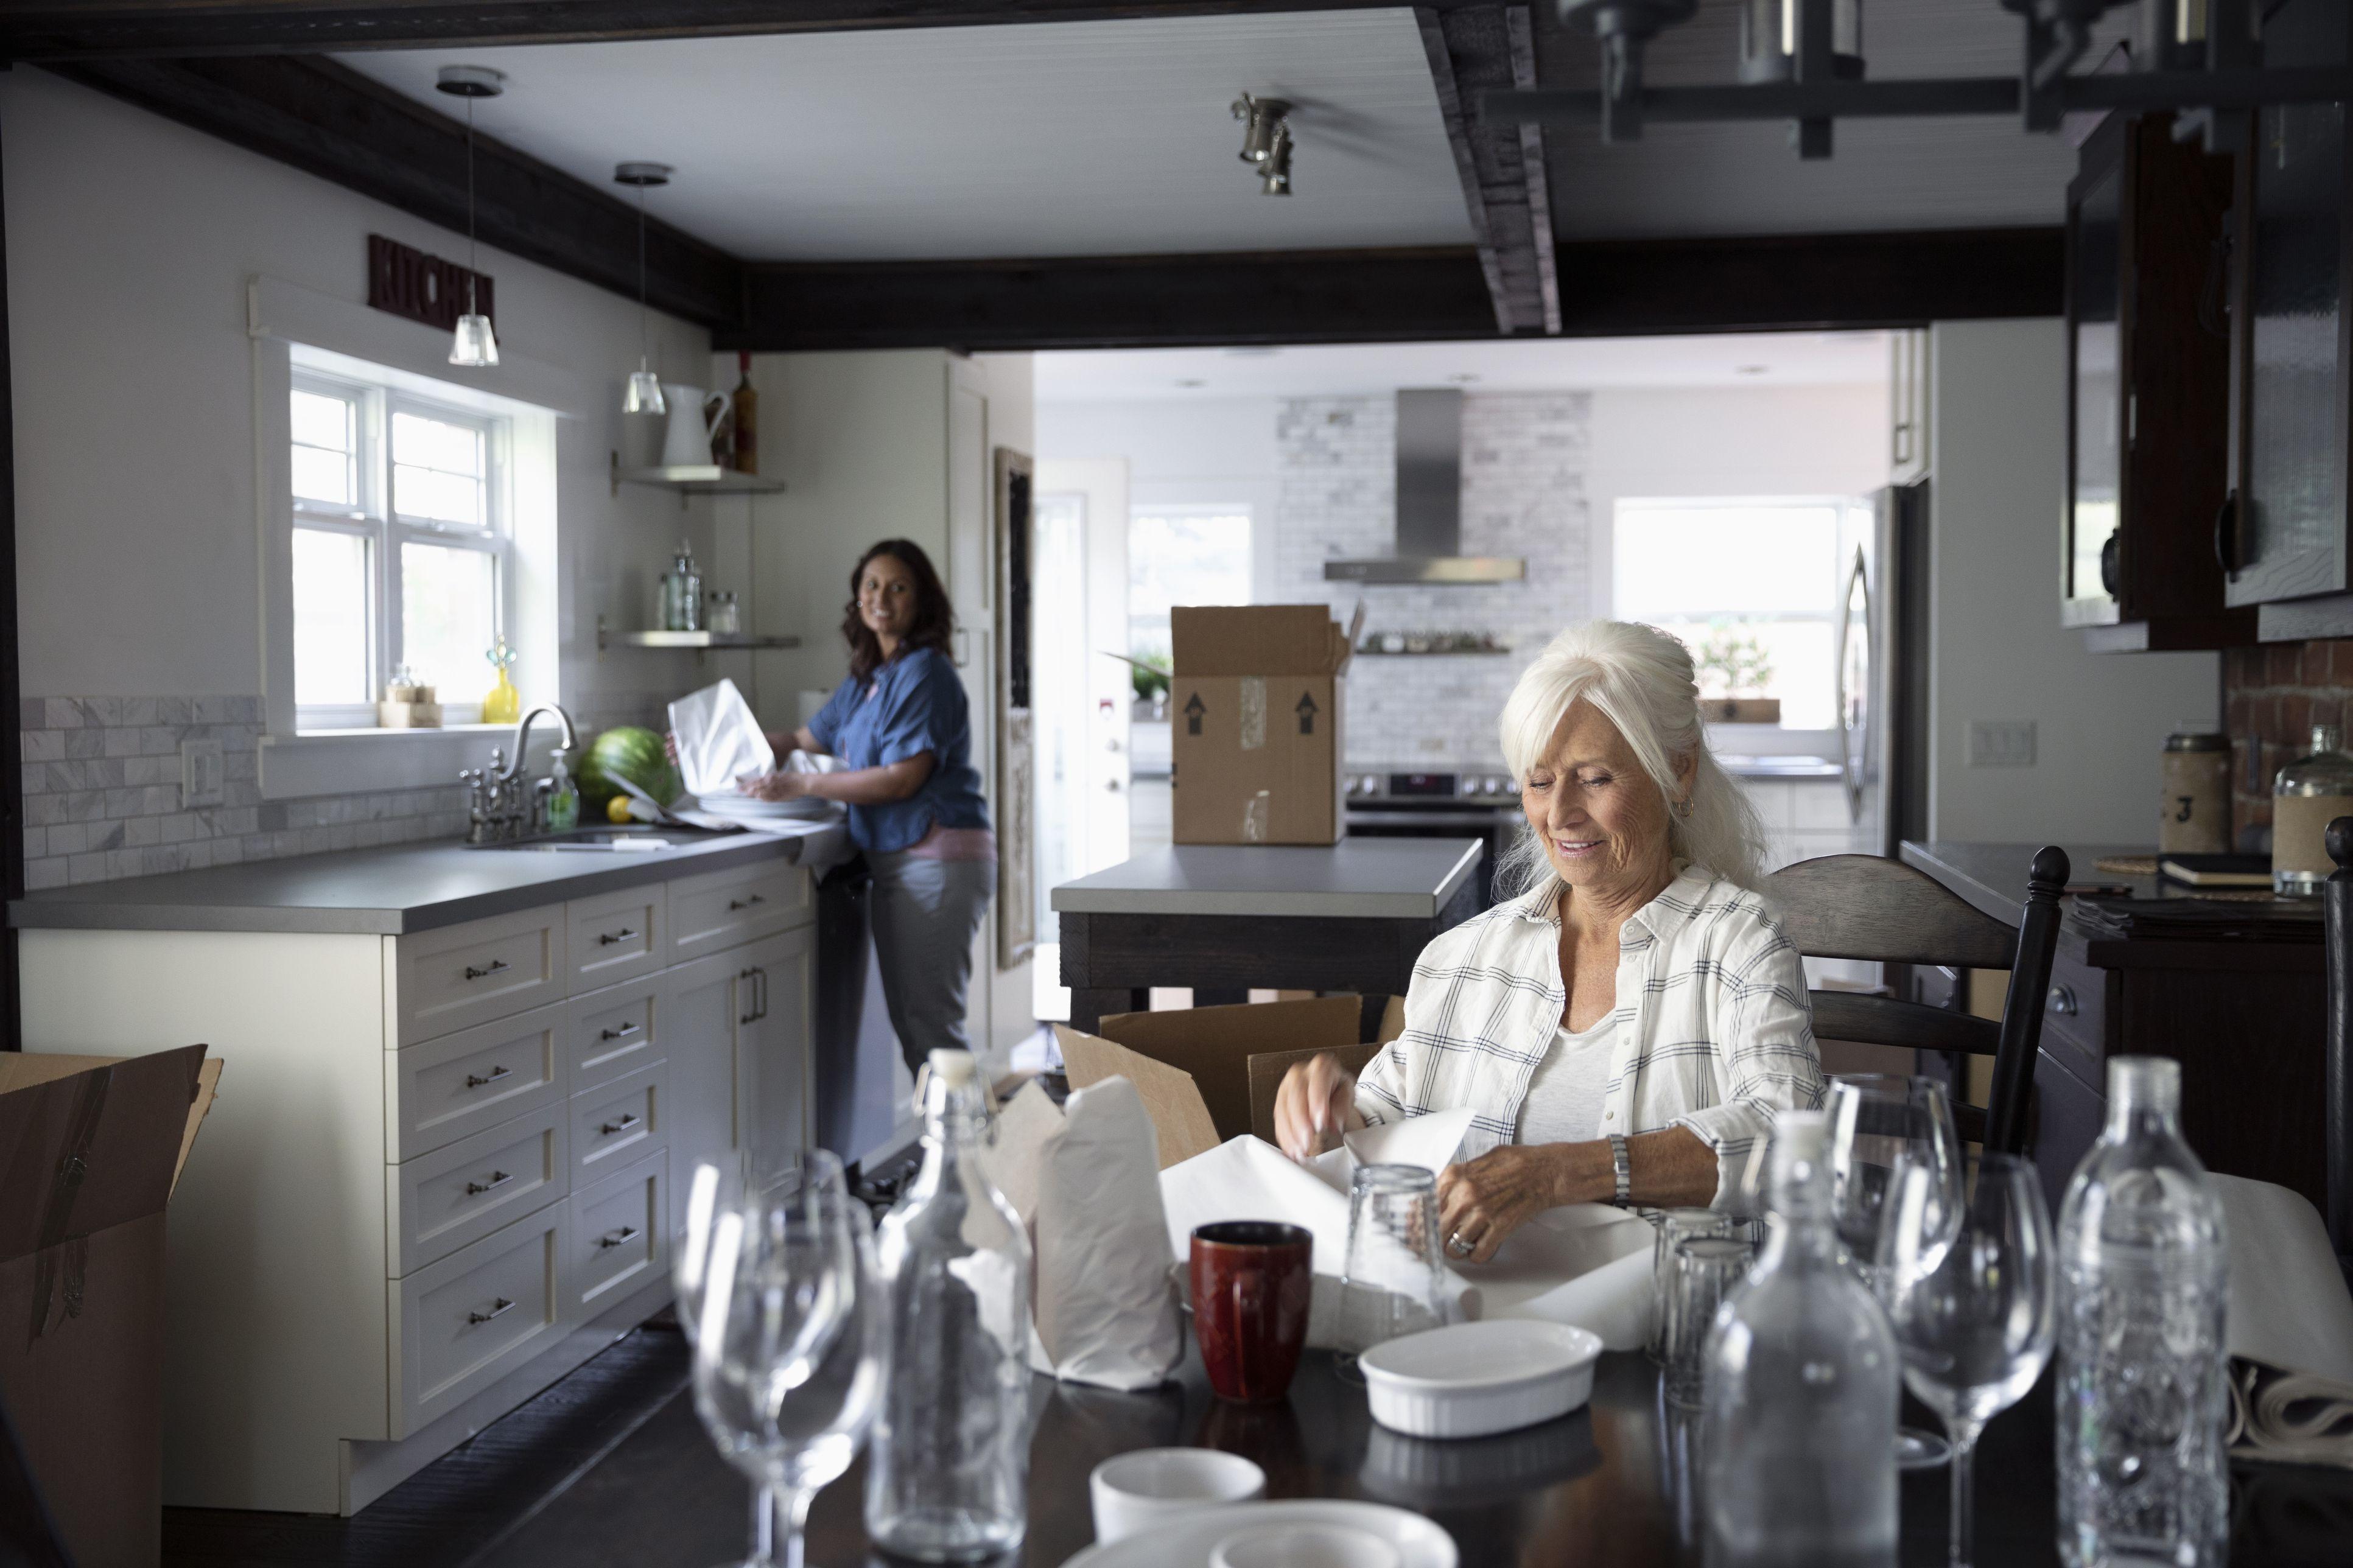 Senior woman downsizing, packing dishes